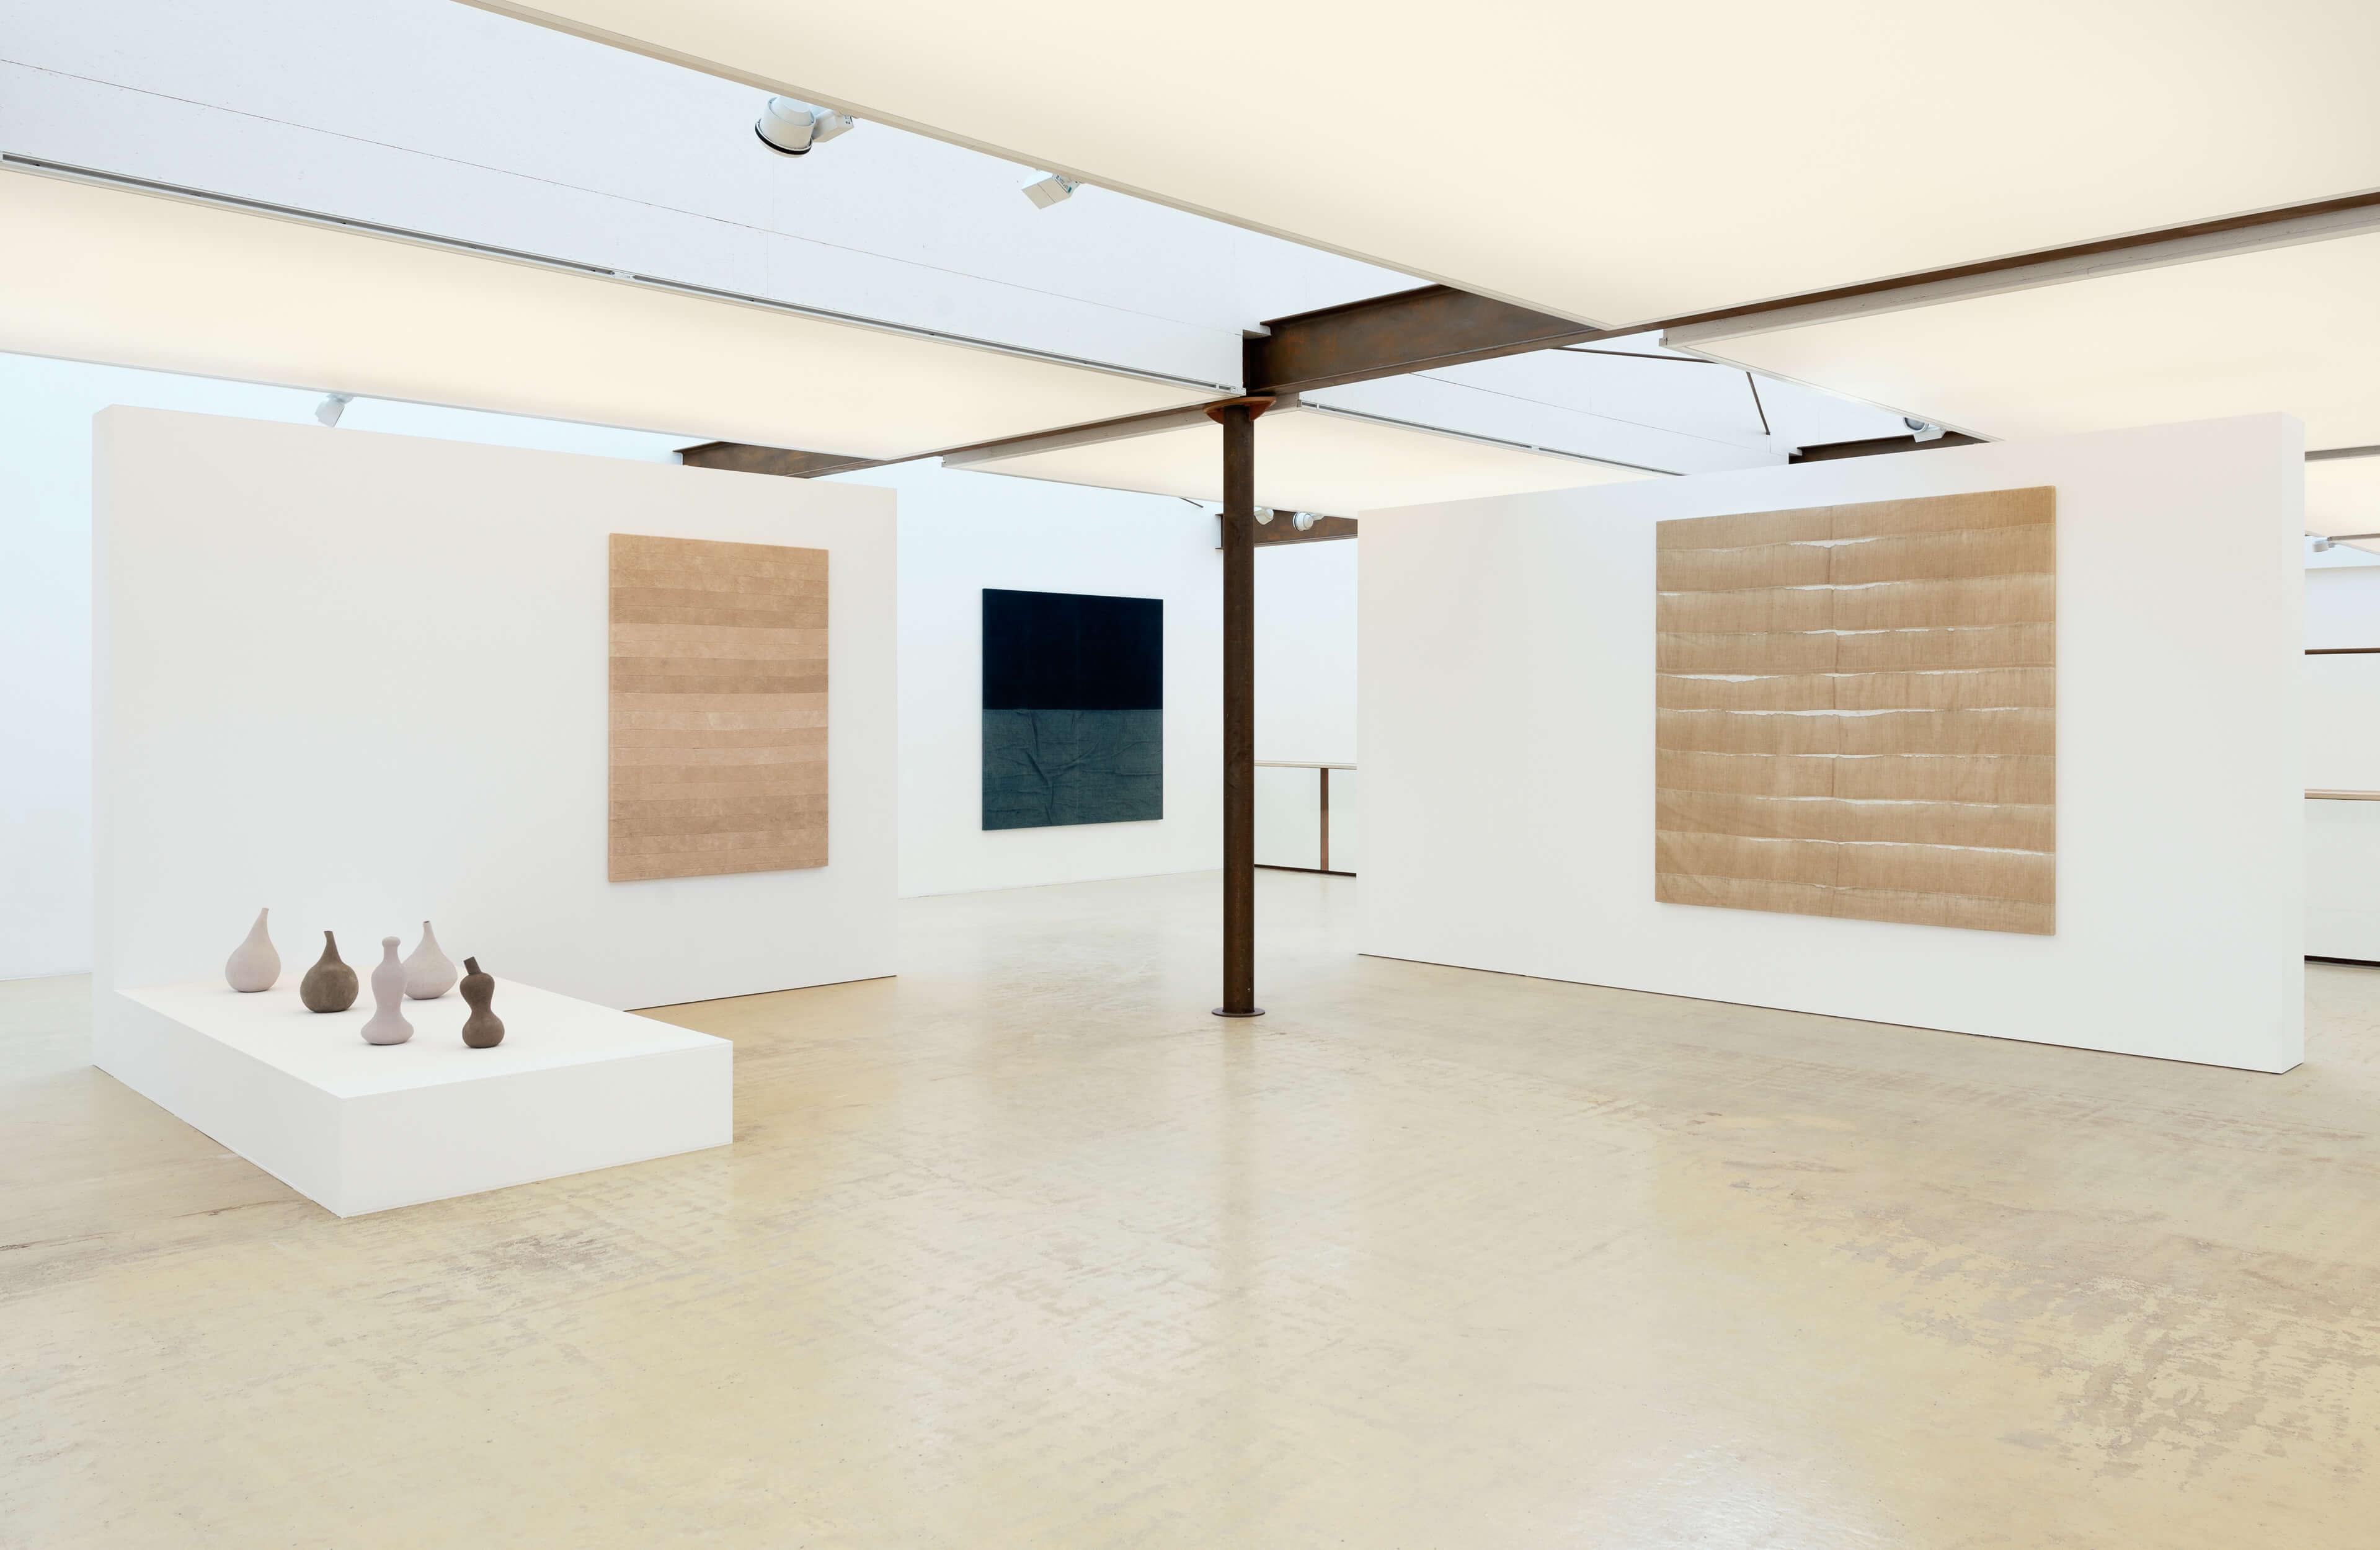 Kunstwerk - Sammlung Klein - Nussdorf - Museum - Kunst - Art - Baden-Württemberg - Hängung #19 - Enrico Bach - Franziska Holstein - Ayan Farah -Malerei - Installation - Ebene 3